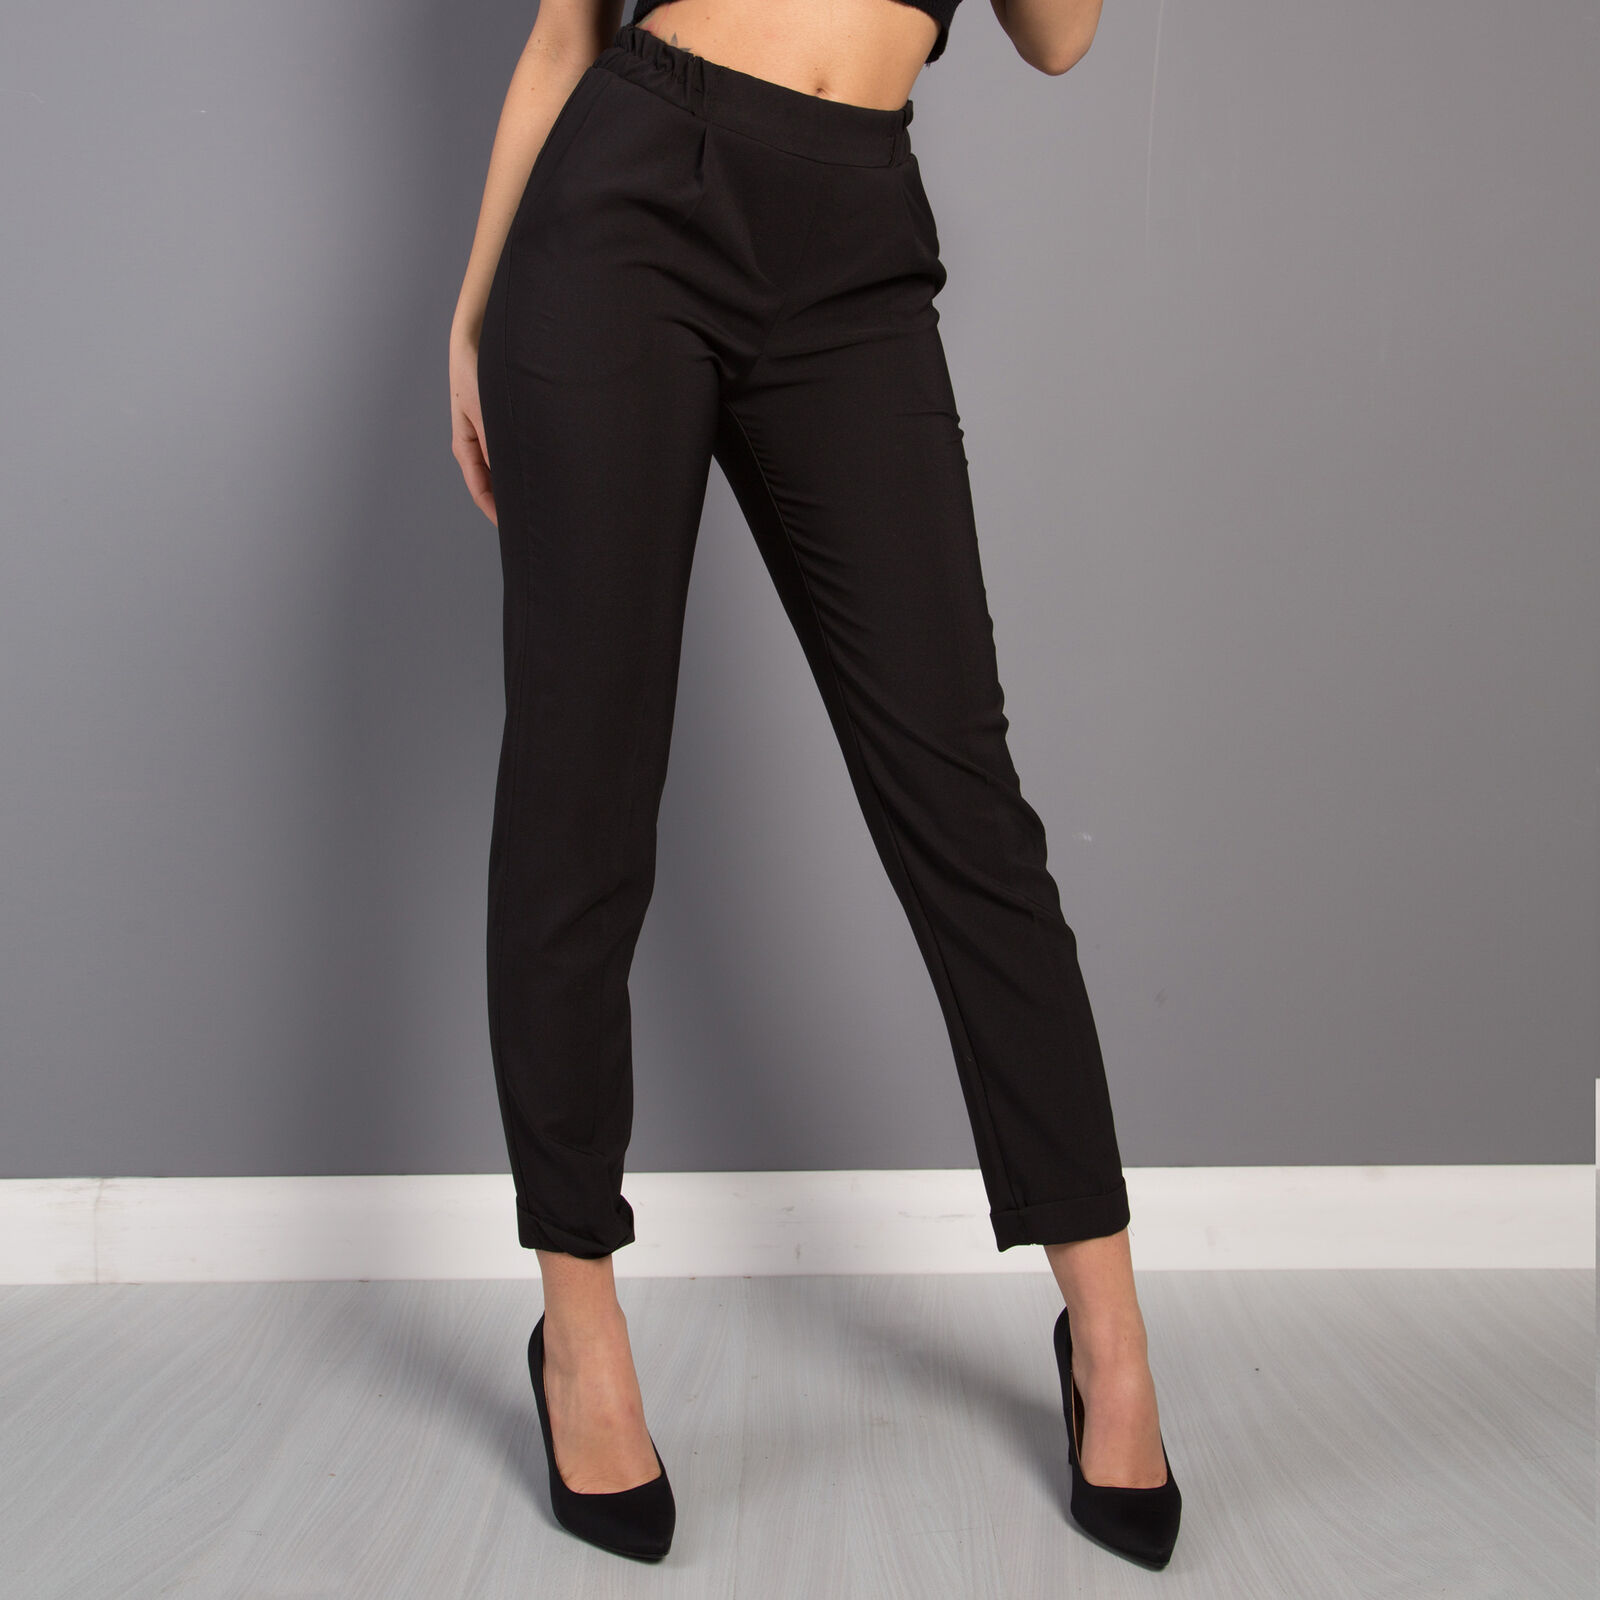 7d66845b3899 Pantalone donna a sigaretta sartoriale slim fit tasche elastico vita alta  9024